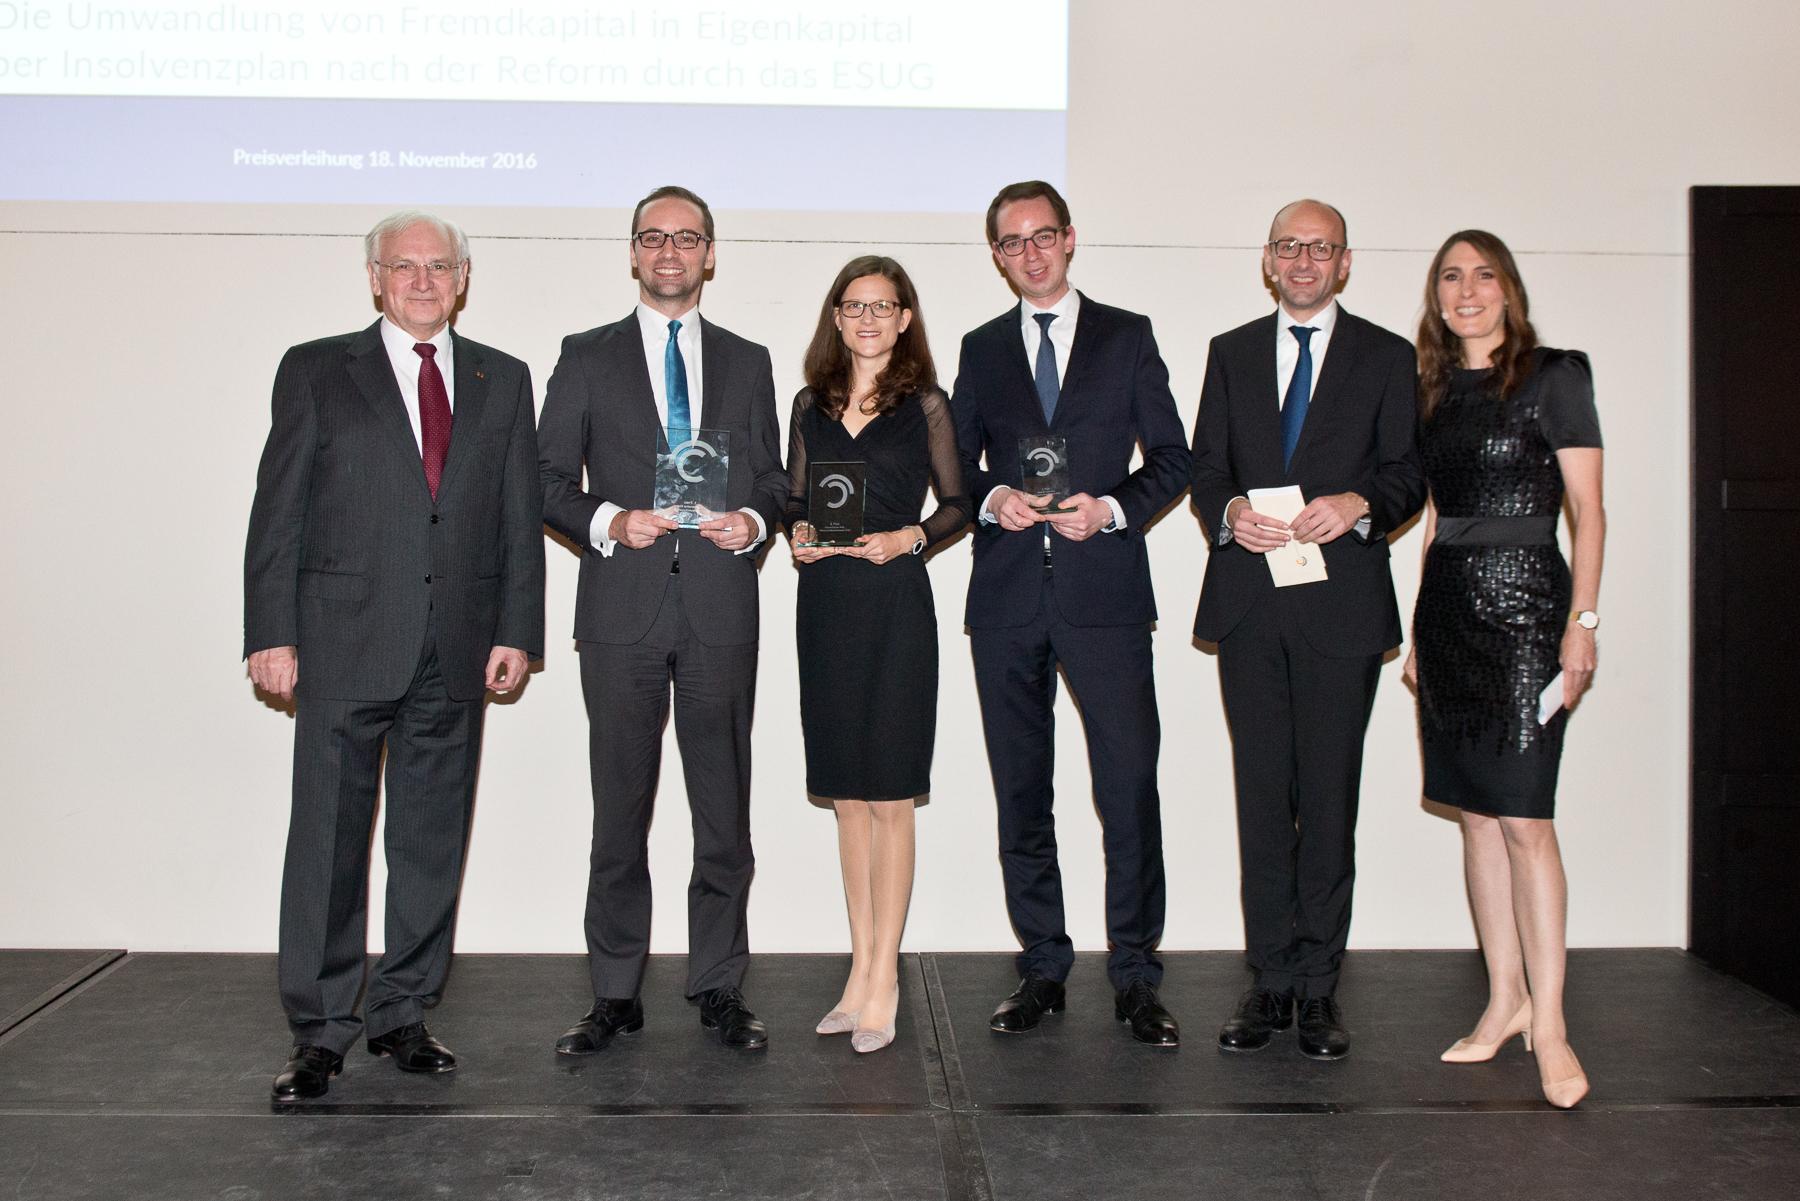 Prof. Dr. Siegfried Beck, Dr. Florian Bartels (1. Preis), Dr. Andrea Braun (2. Preis), Dr. Helge Pühl (3. Preis), Prof. Dr. Lucas F. Flöther, Anja Kohl